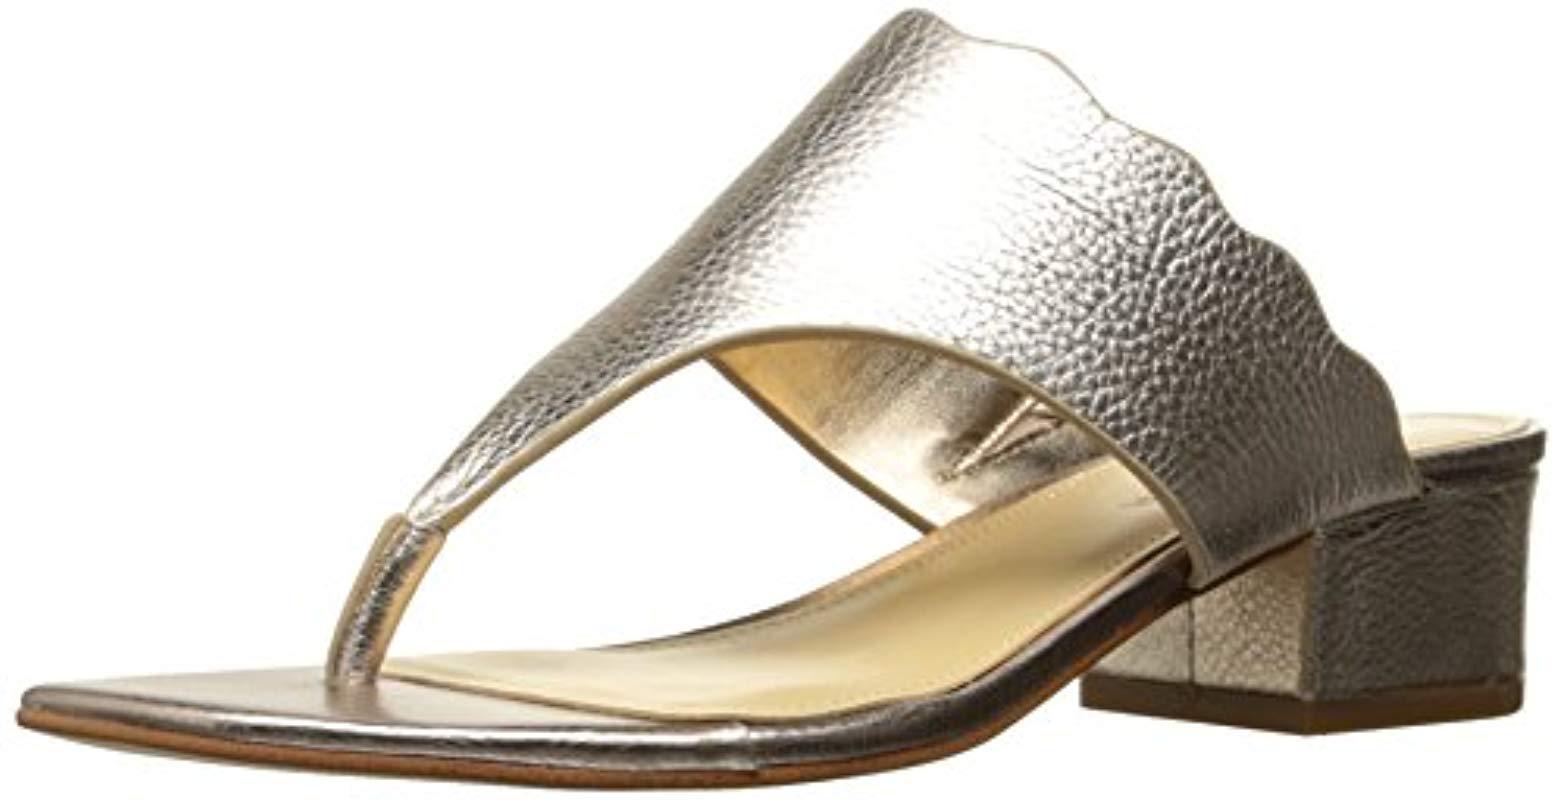 b3ca34630 Lyst - Marc Fisher Veva Flat Sandal in Metallic - Save 37%